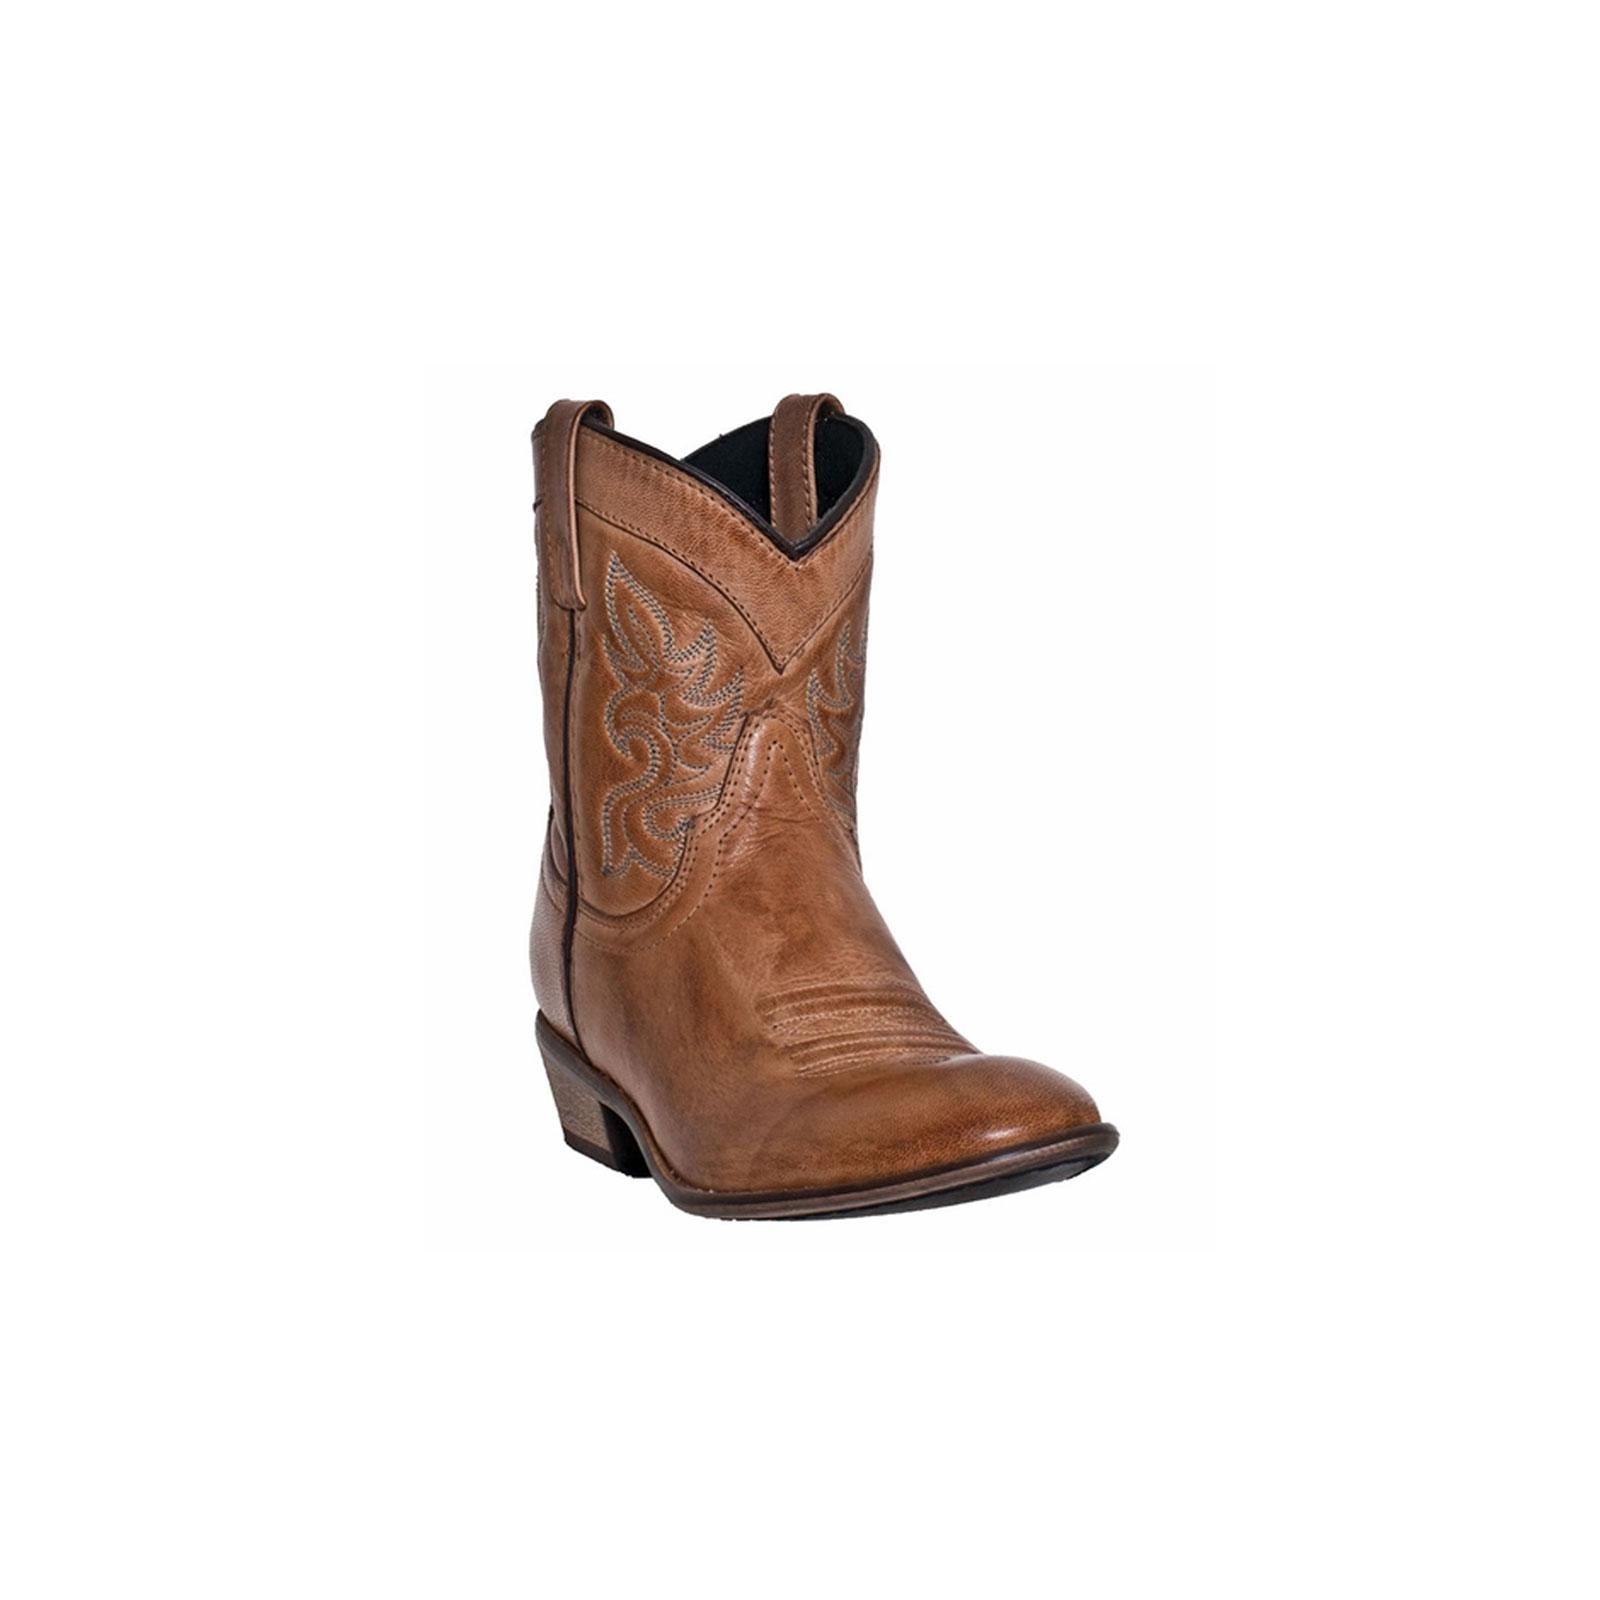 Dingo Antique Western Boots Womens Willie Antique Dingo Collar Tan DI 862 7dea44